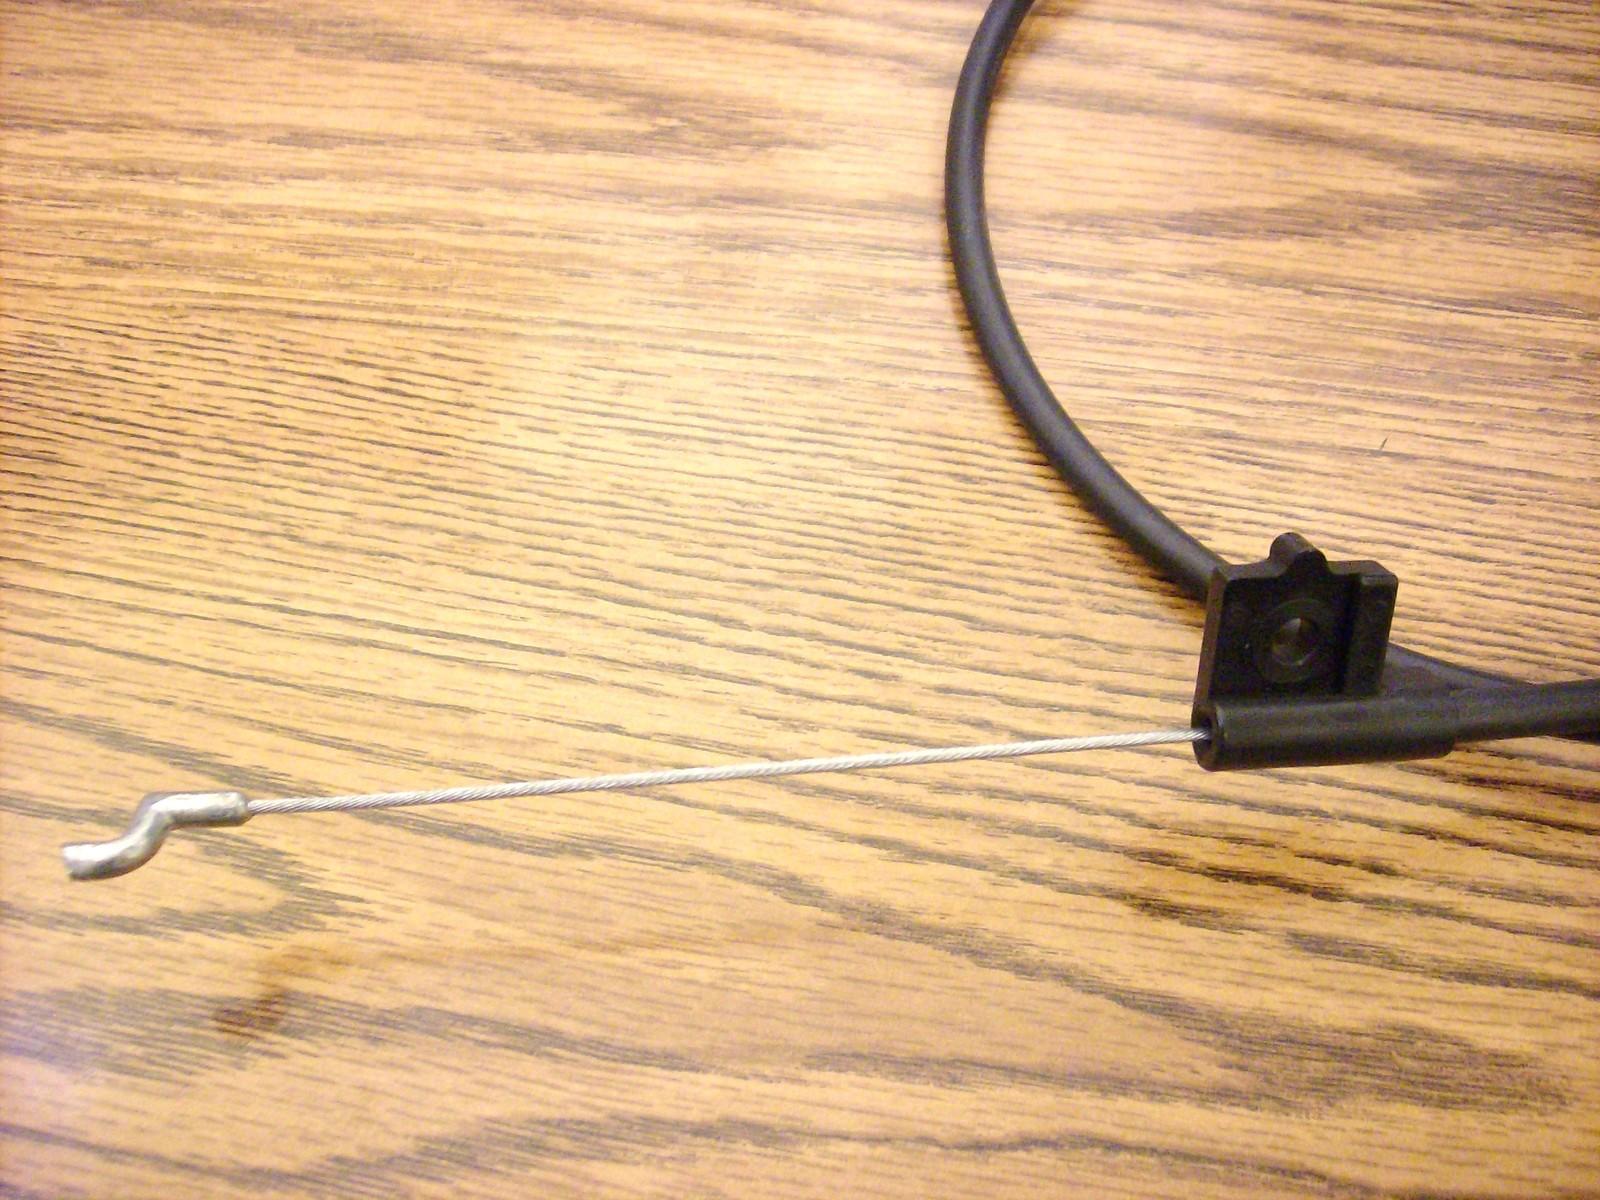 Murray lawn mower engine stop kill run control zone cable 43361, 43361MA